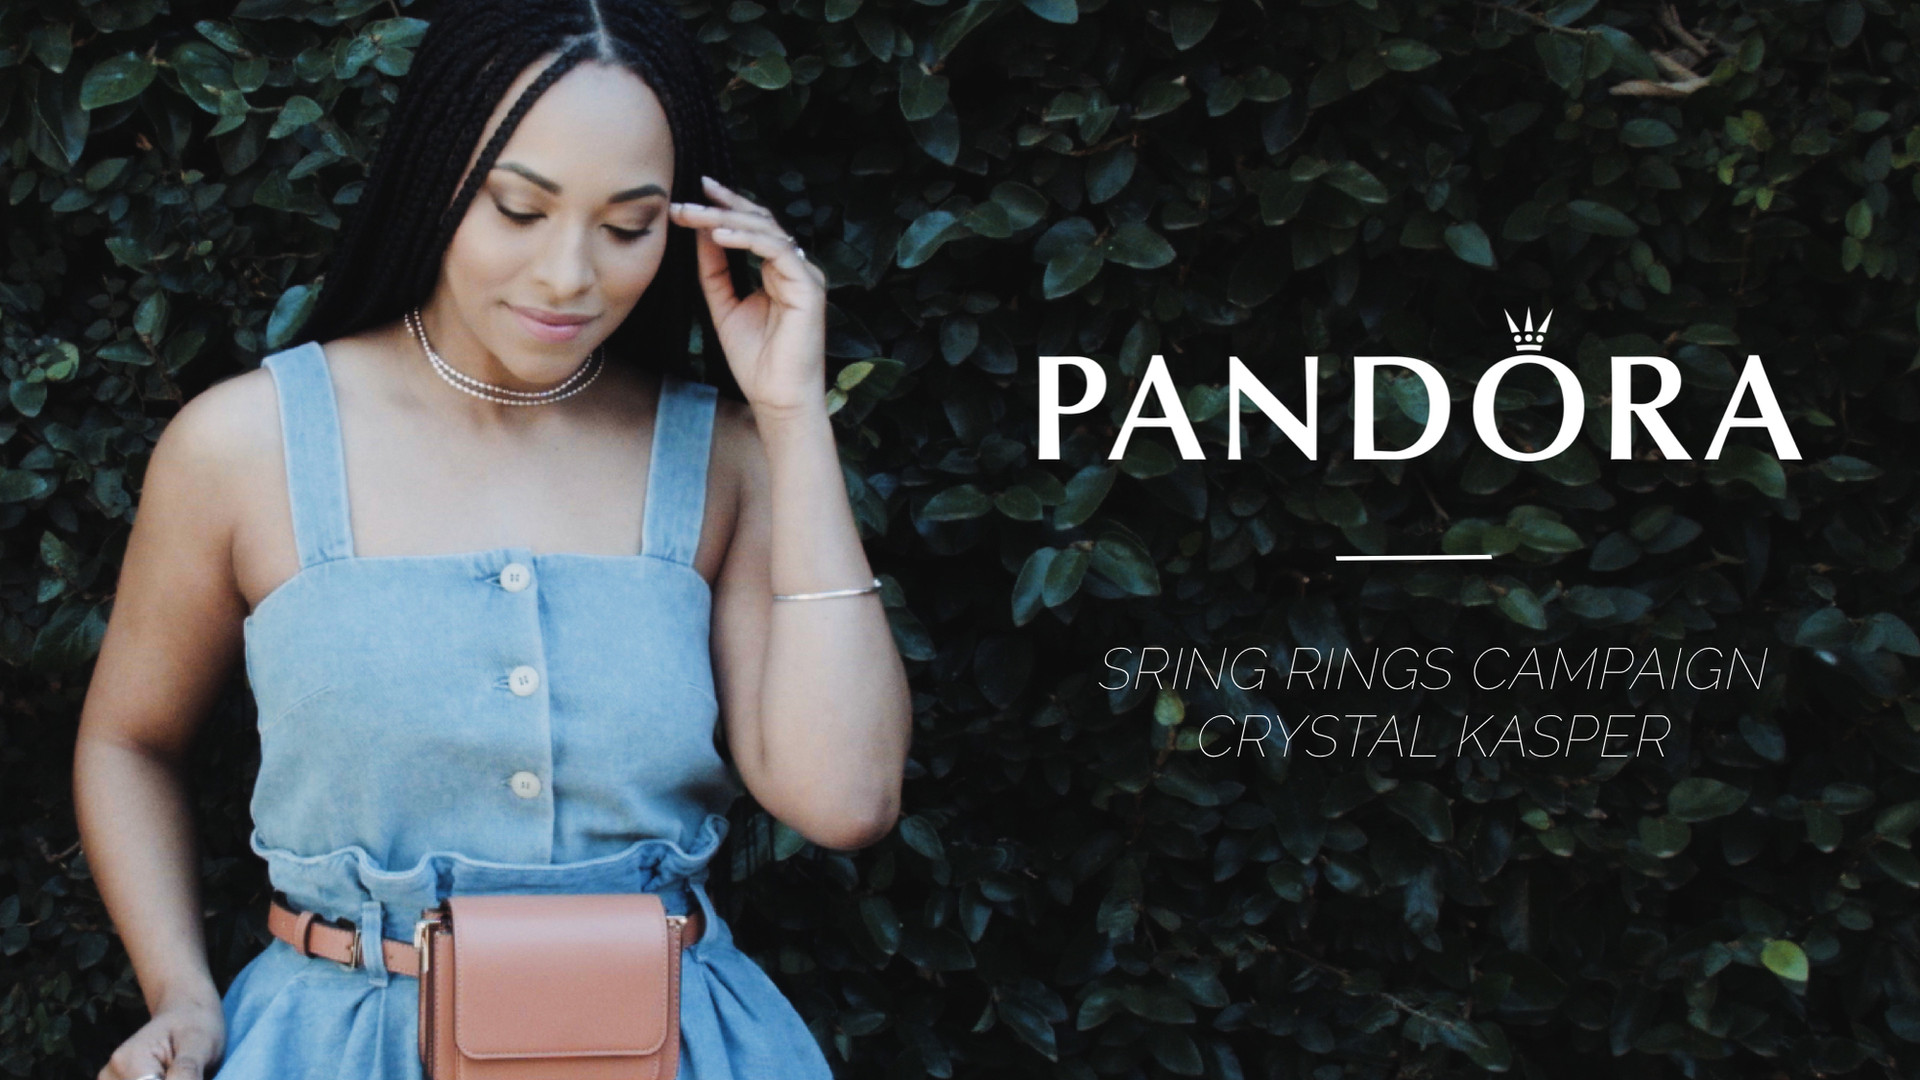 Crystal Kasper for Pandora Spring Rings Campaign